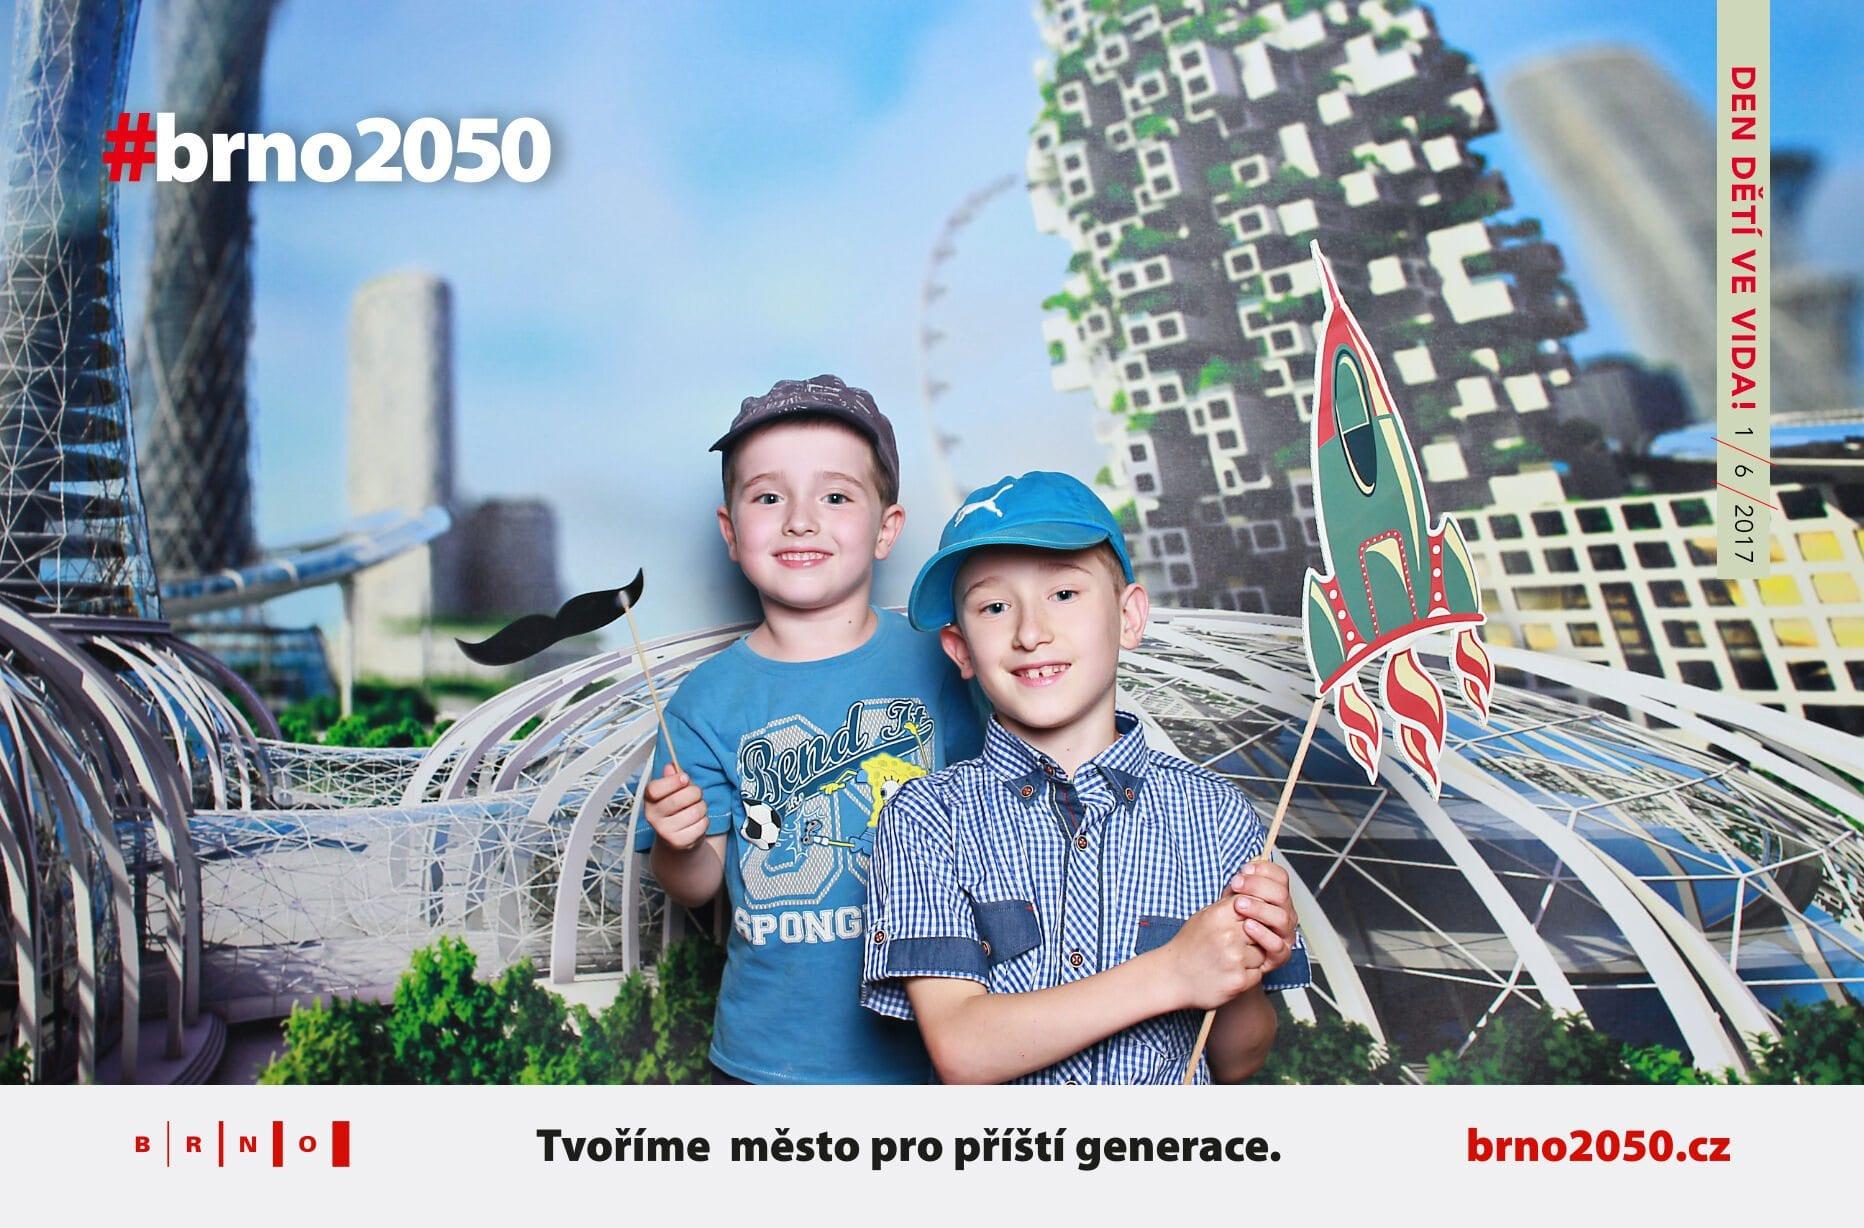 fotokoutek-brno-2050-1-6-2017-257300